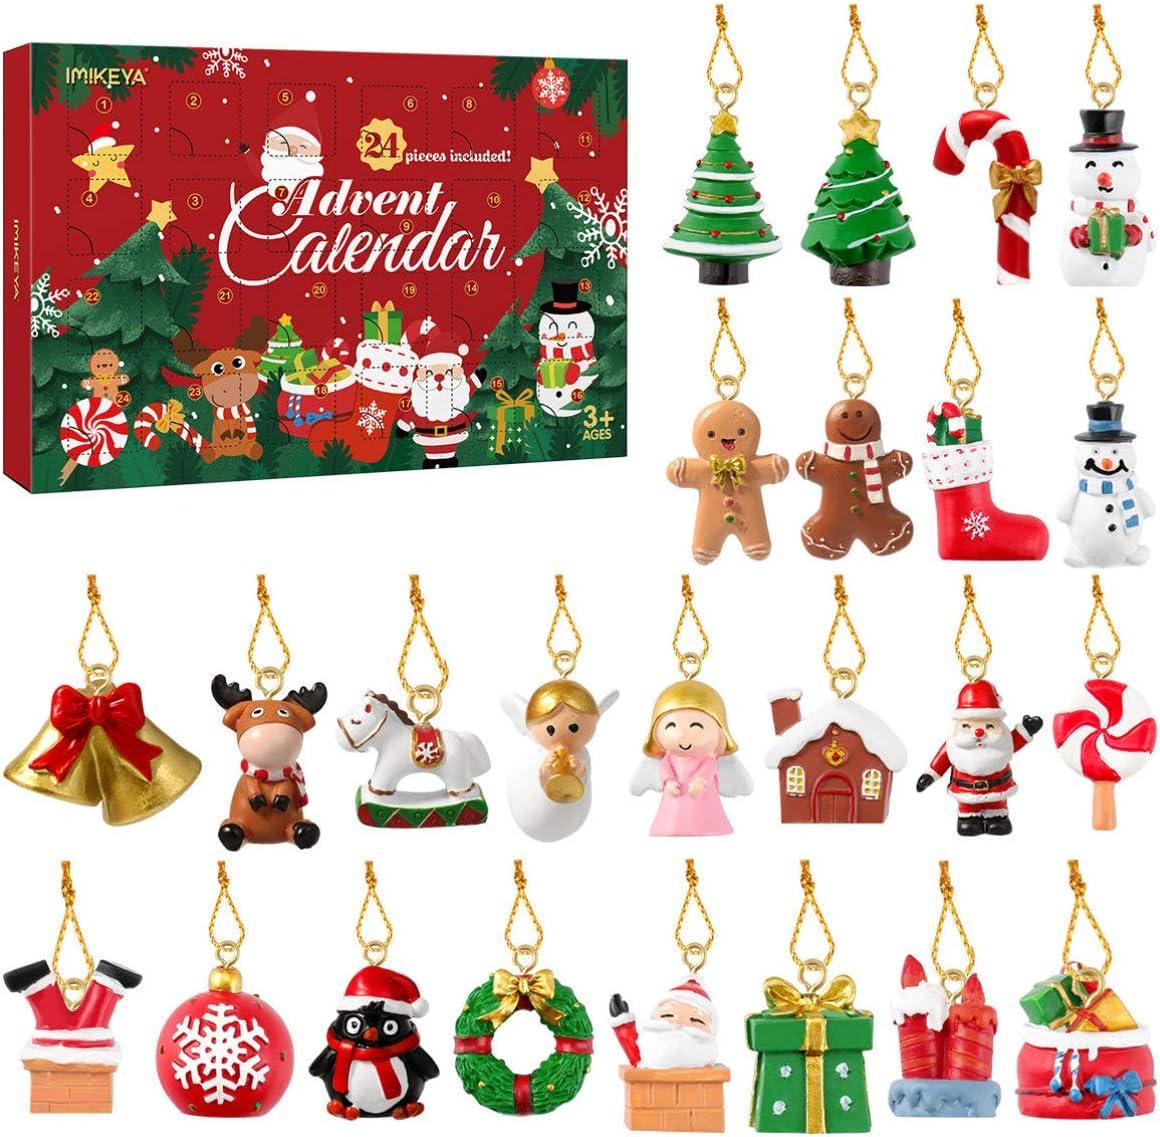 Artibetter クリスマス 吊り飾りセット アドベントカレンダー 24個セット